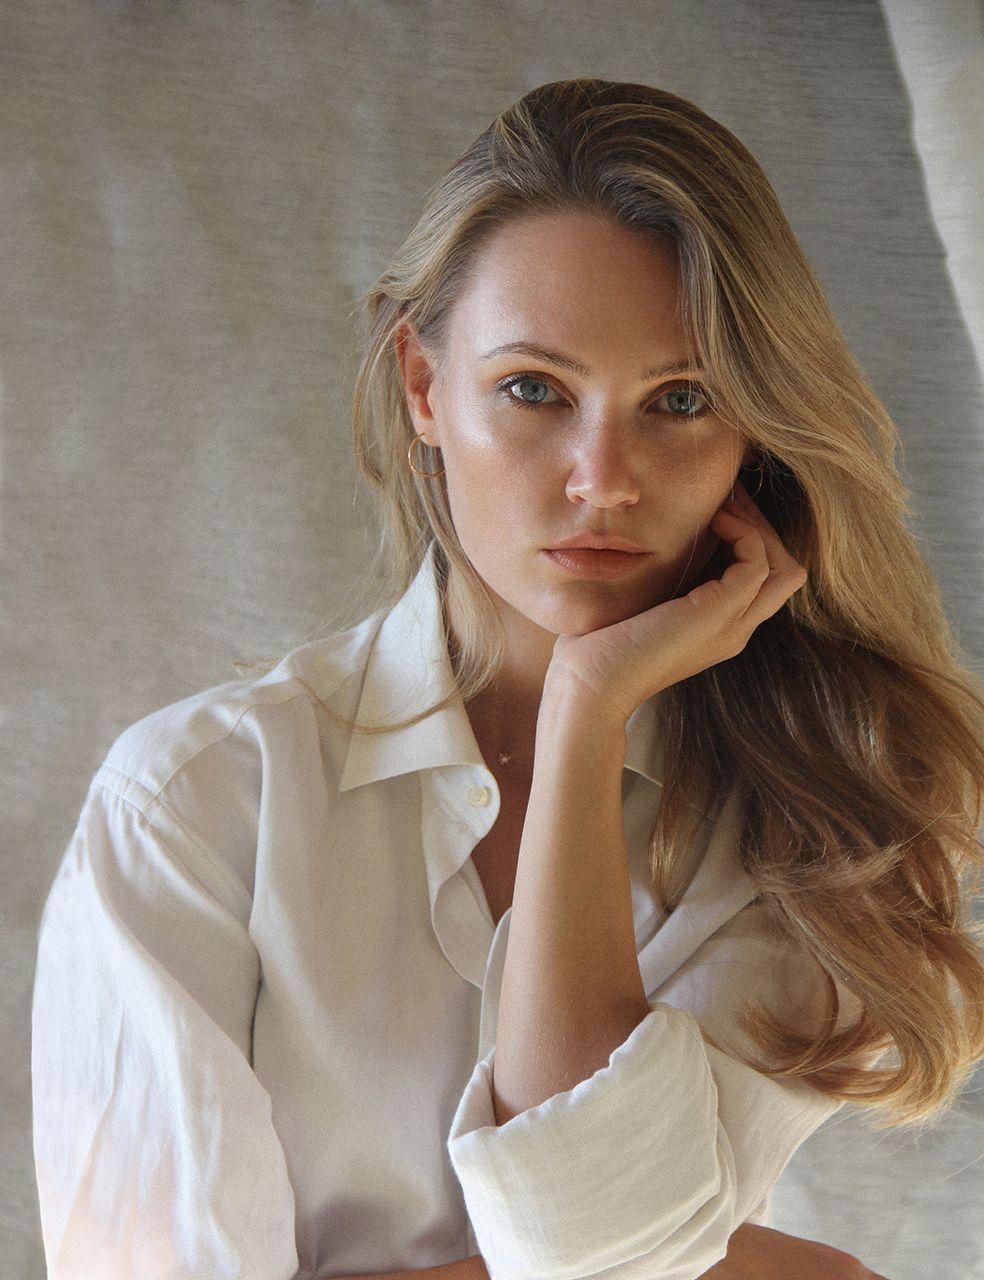 Caroline_Wendelin_portrait_-.jpg